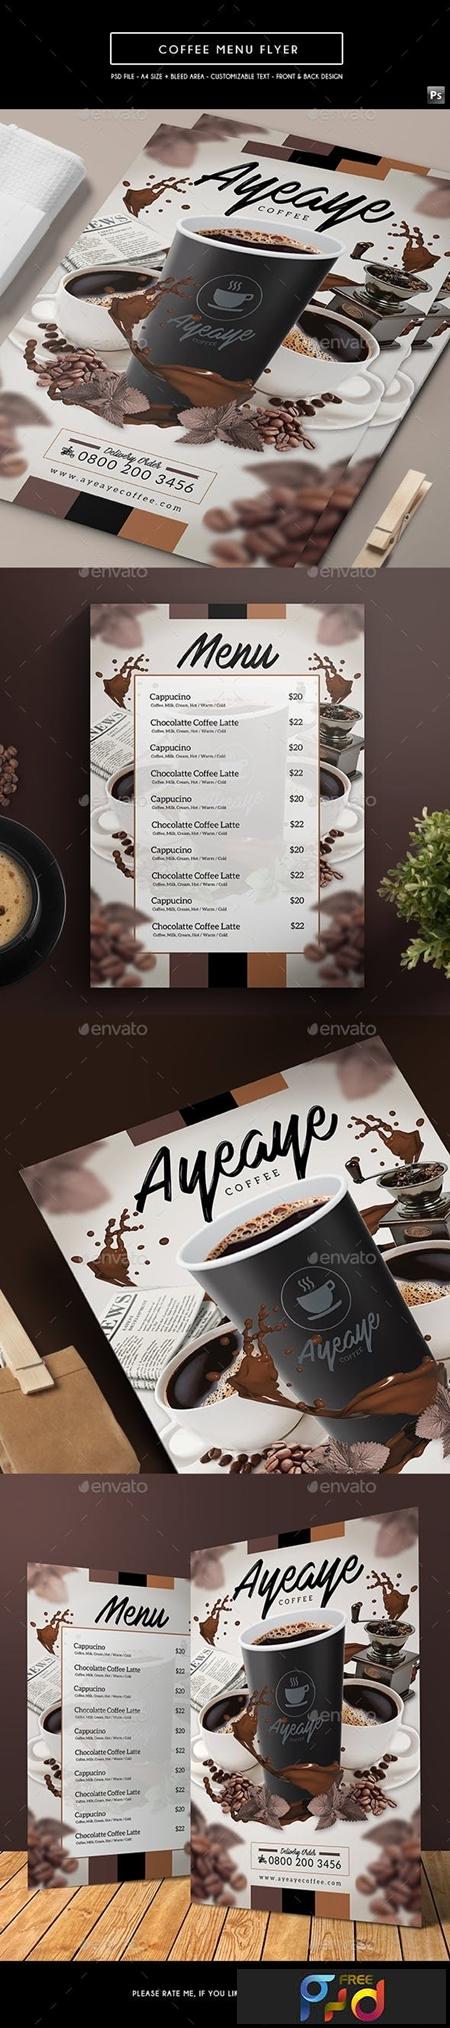 Coffee Menu Flyer 17964158 1